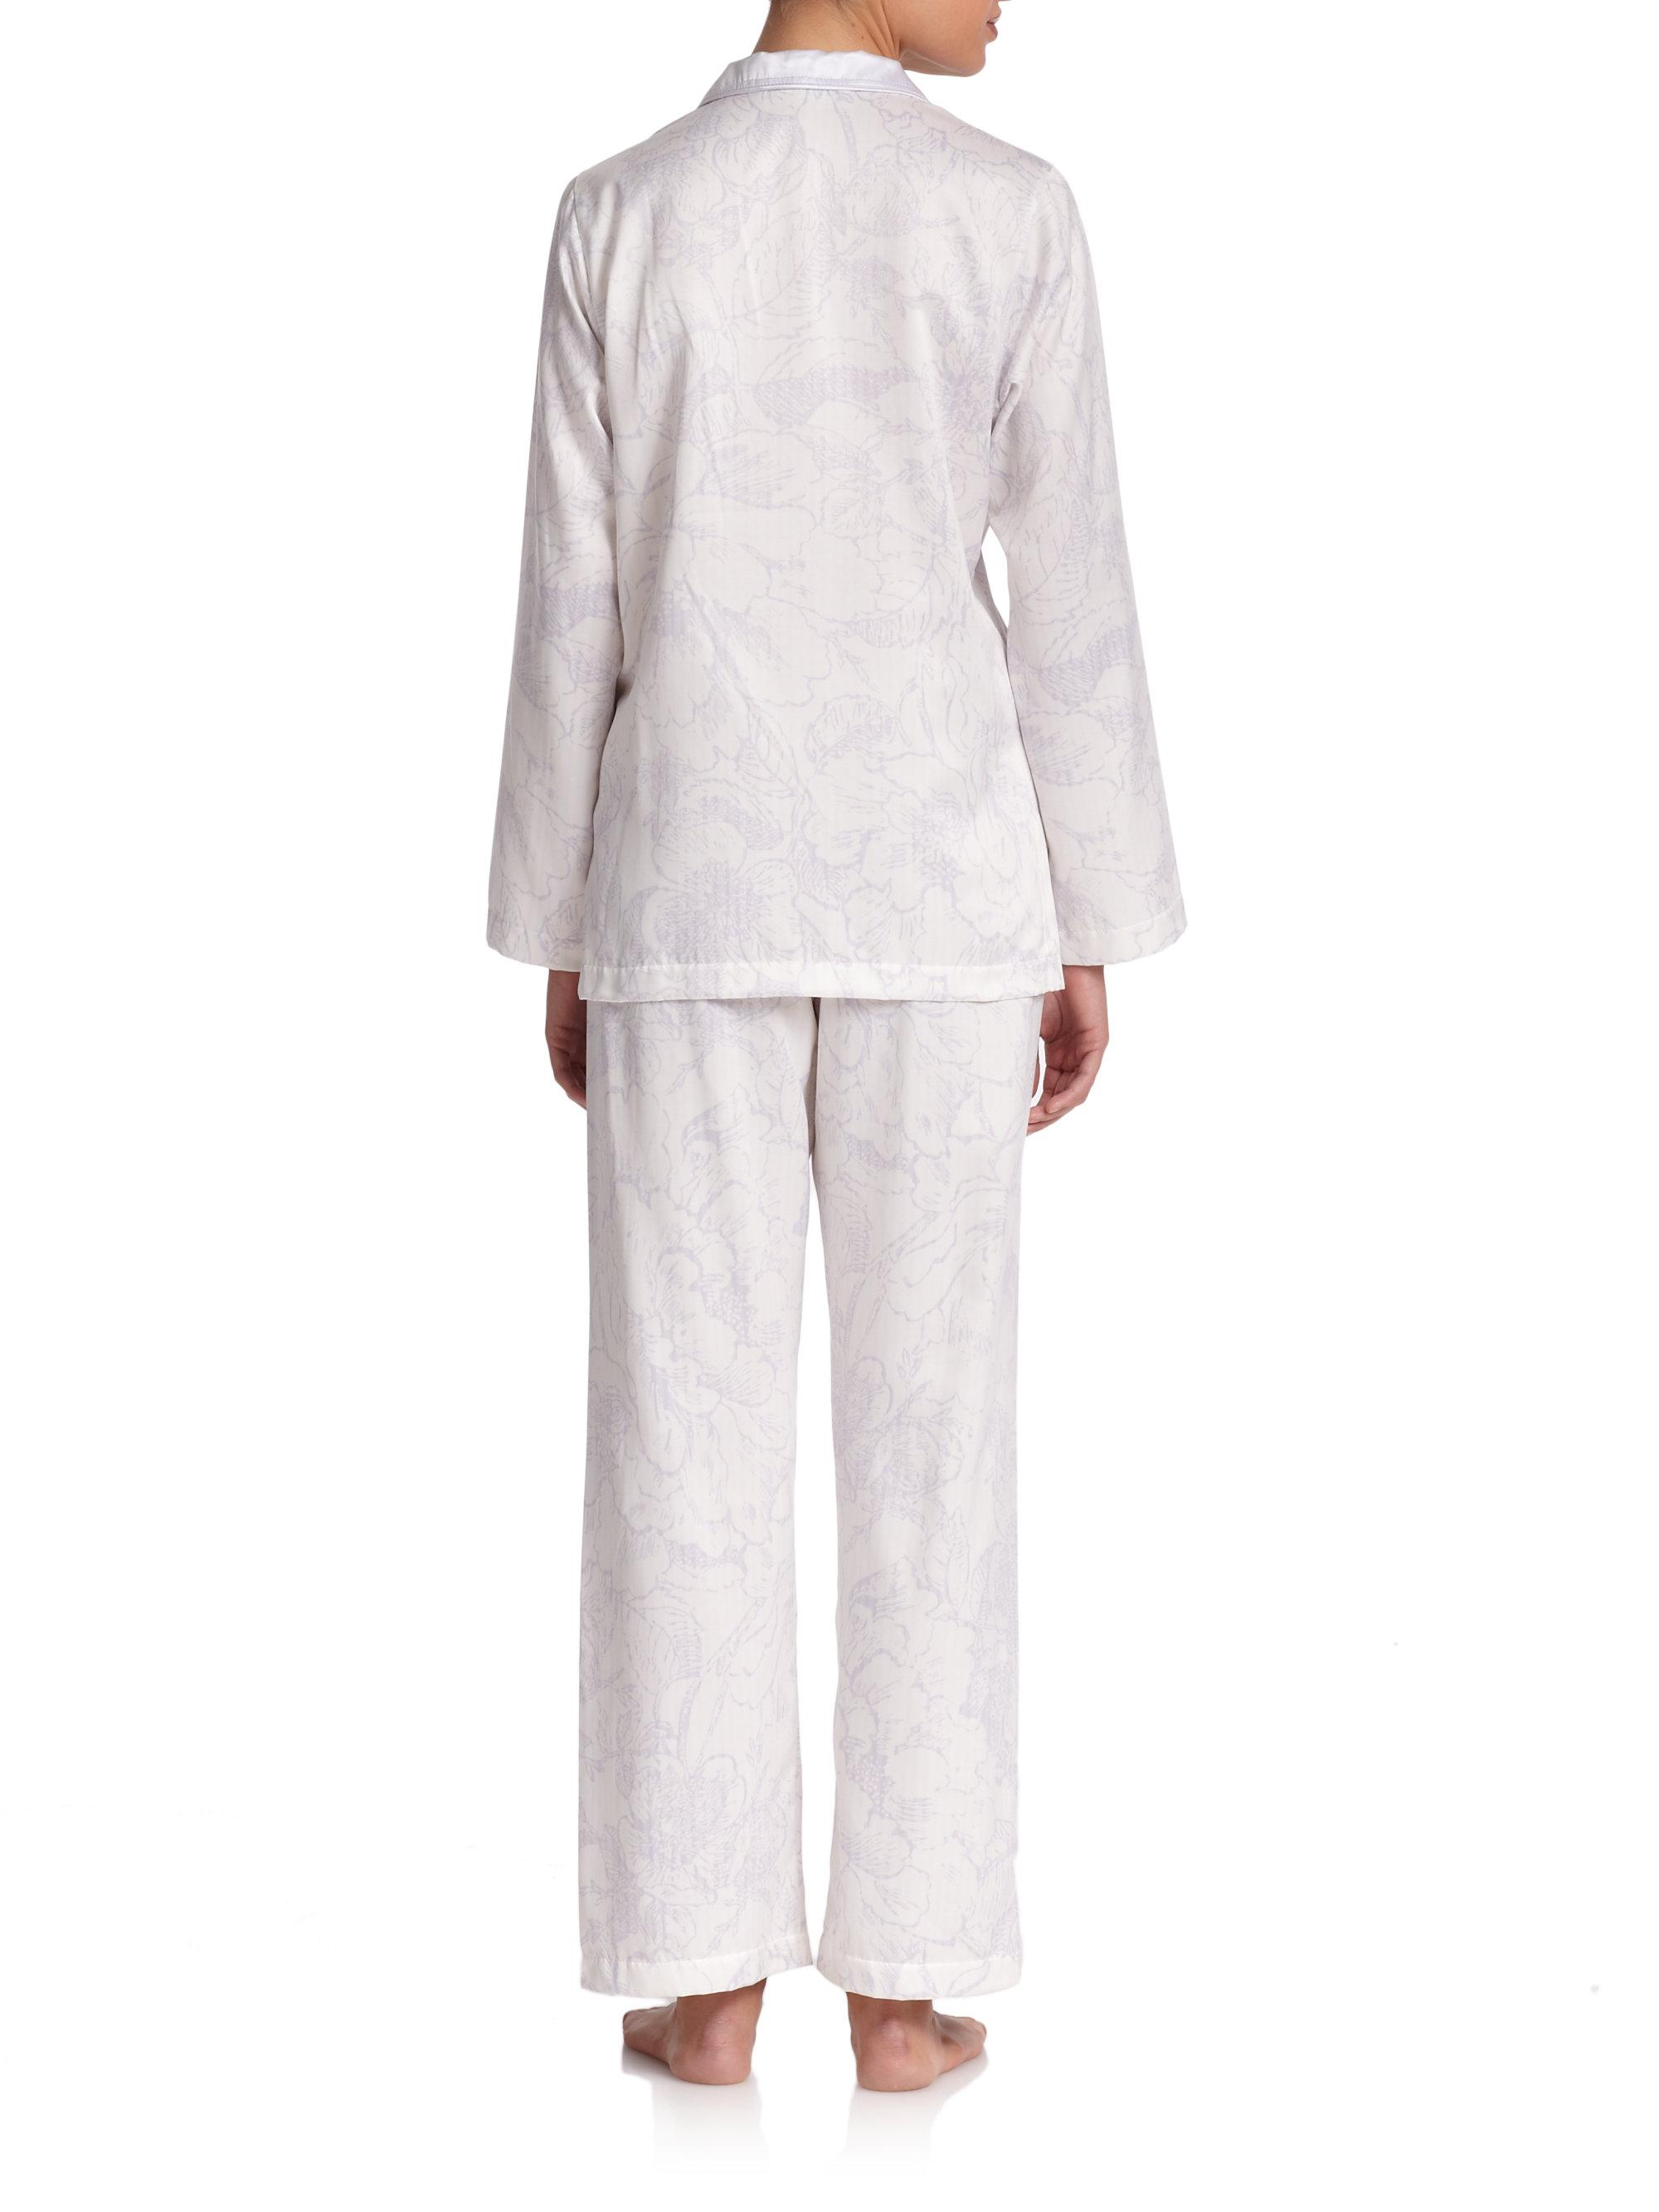 Lyst Oscar De La Renta Printed Brushed Back Satin Pajama Set in White